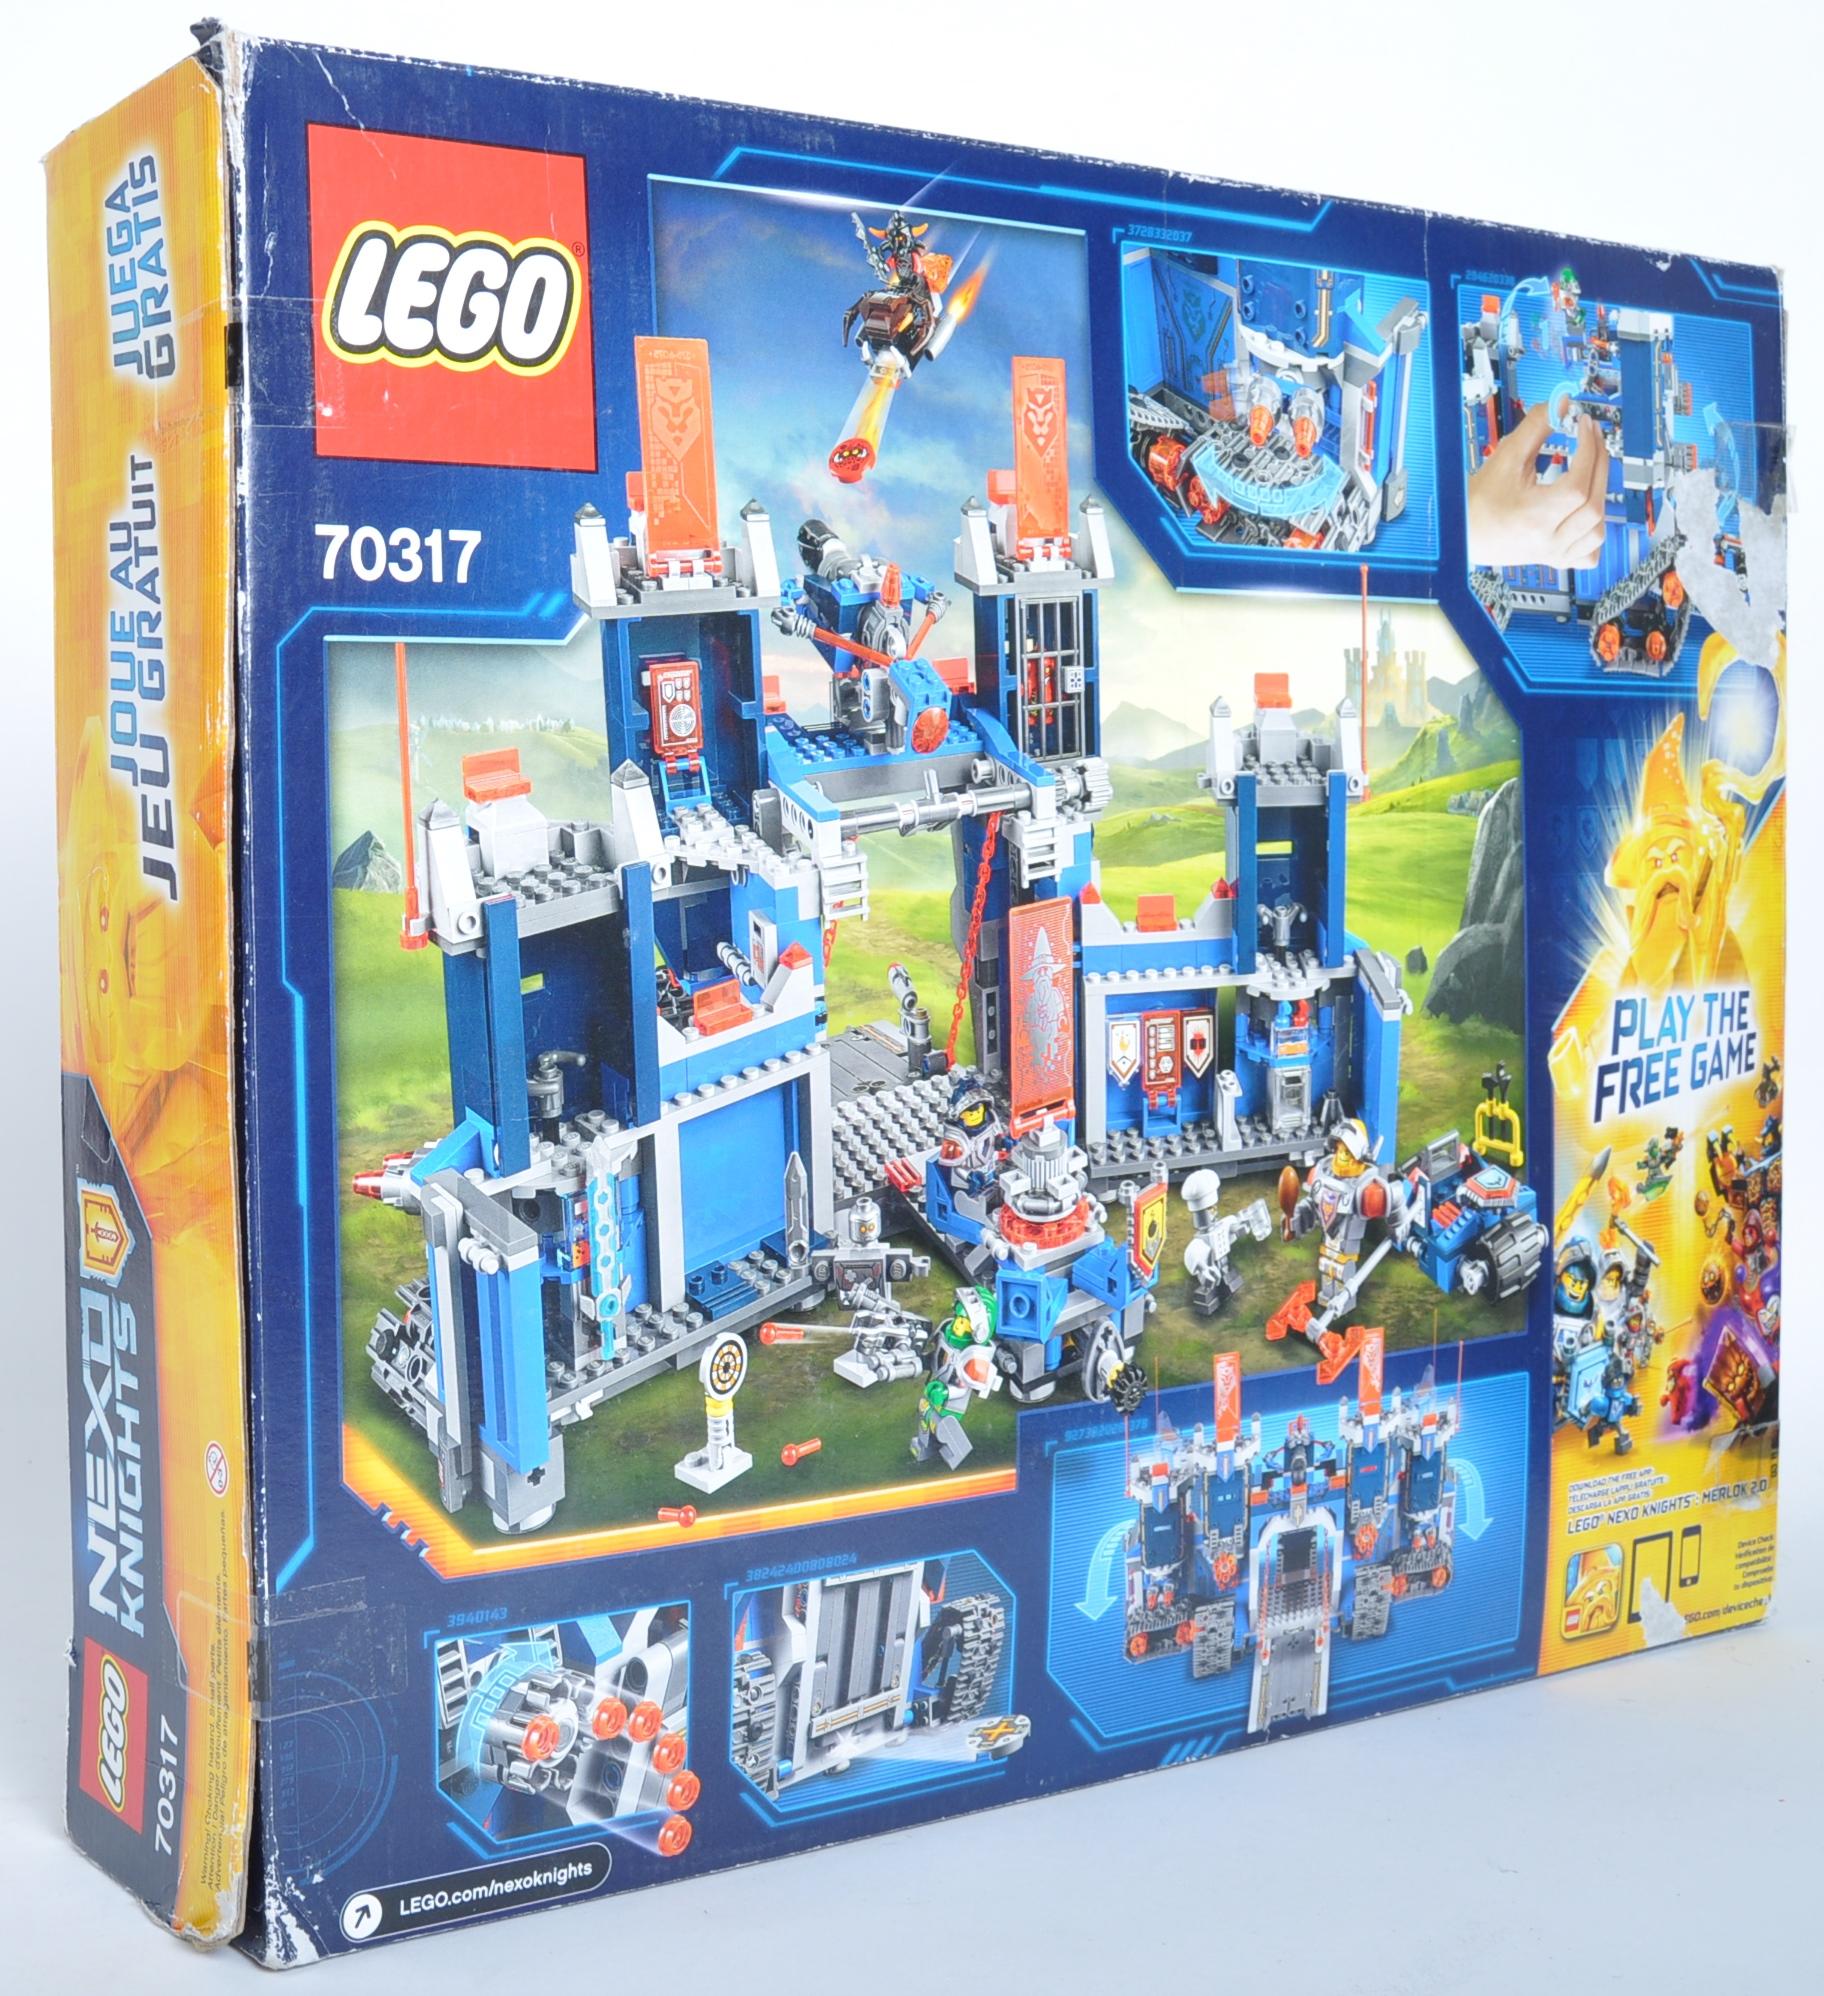 LEGO SET - LEGO NEXO KNIGHTS - 70317 THE FORTREX - Image 4 of 4